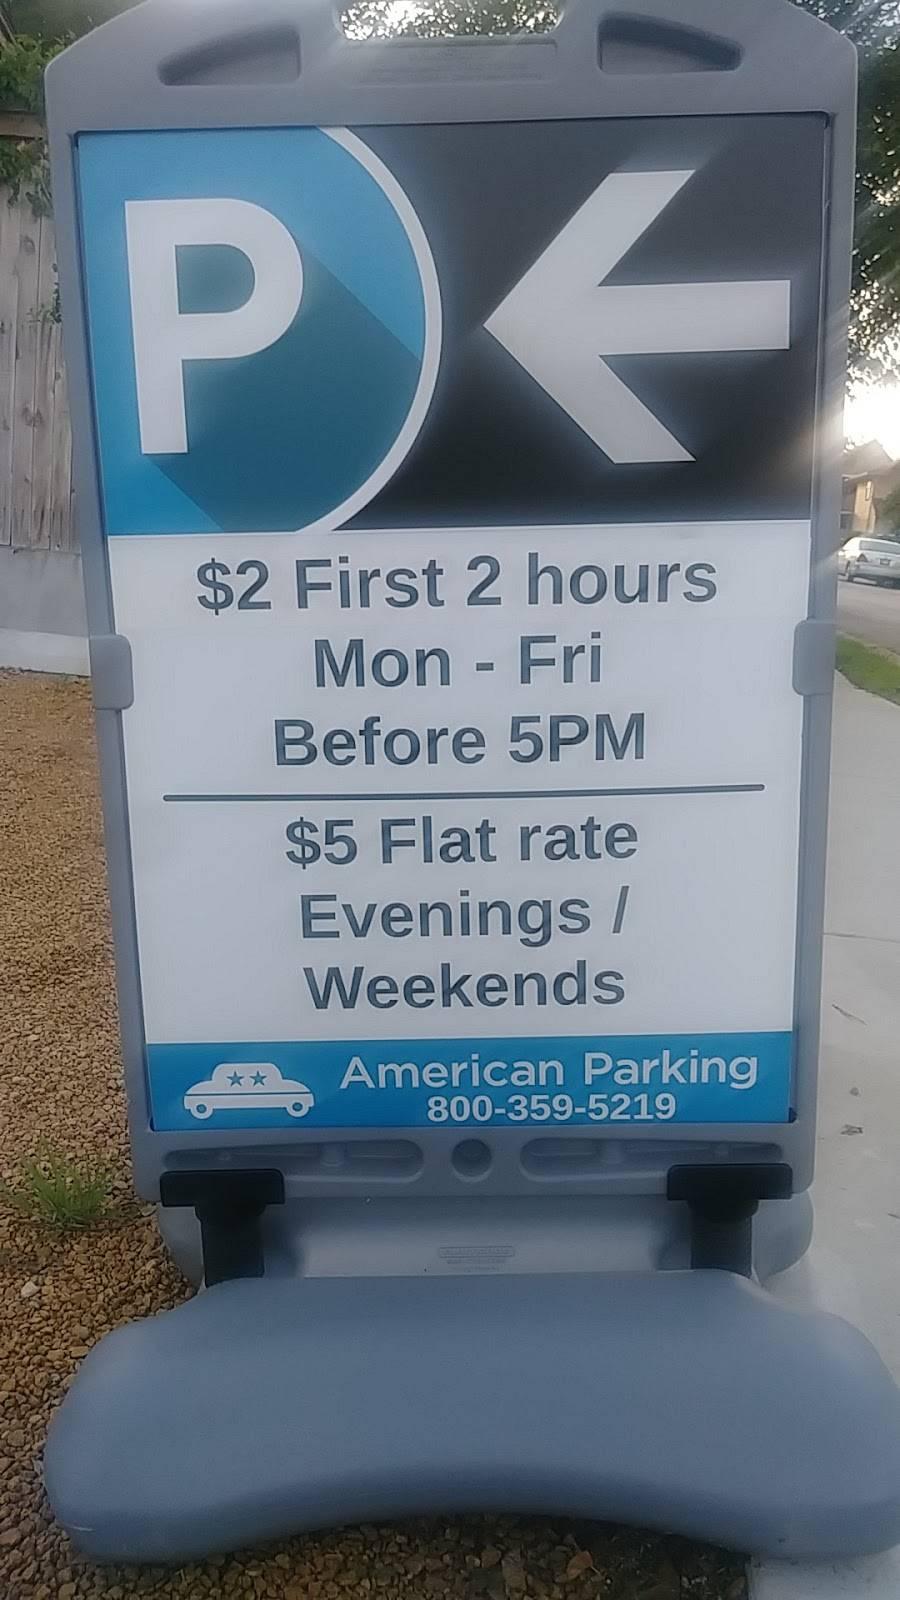 Lot 351 - parking  | Photo 2 of 3 | Address: 1633 NW 15th St, Oklahoma City, OK 73106, USA | Phone: (800) 359-5219